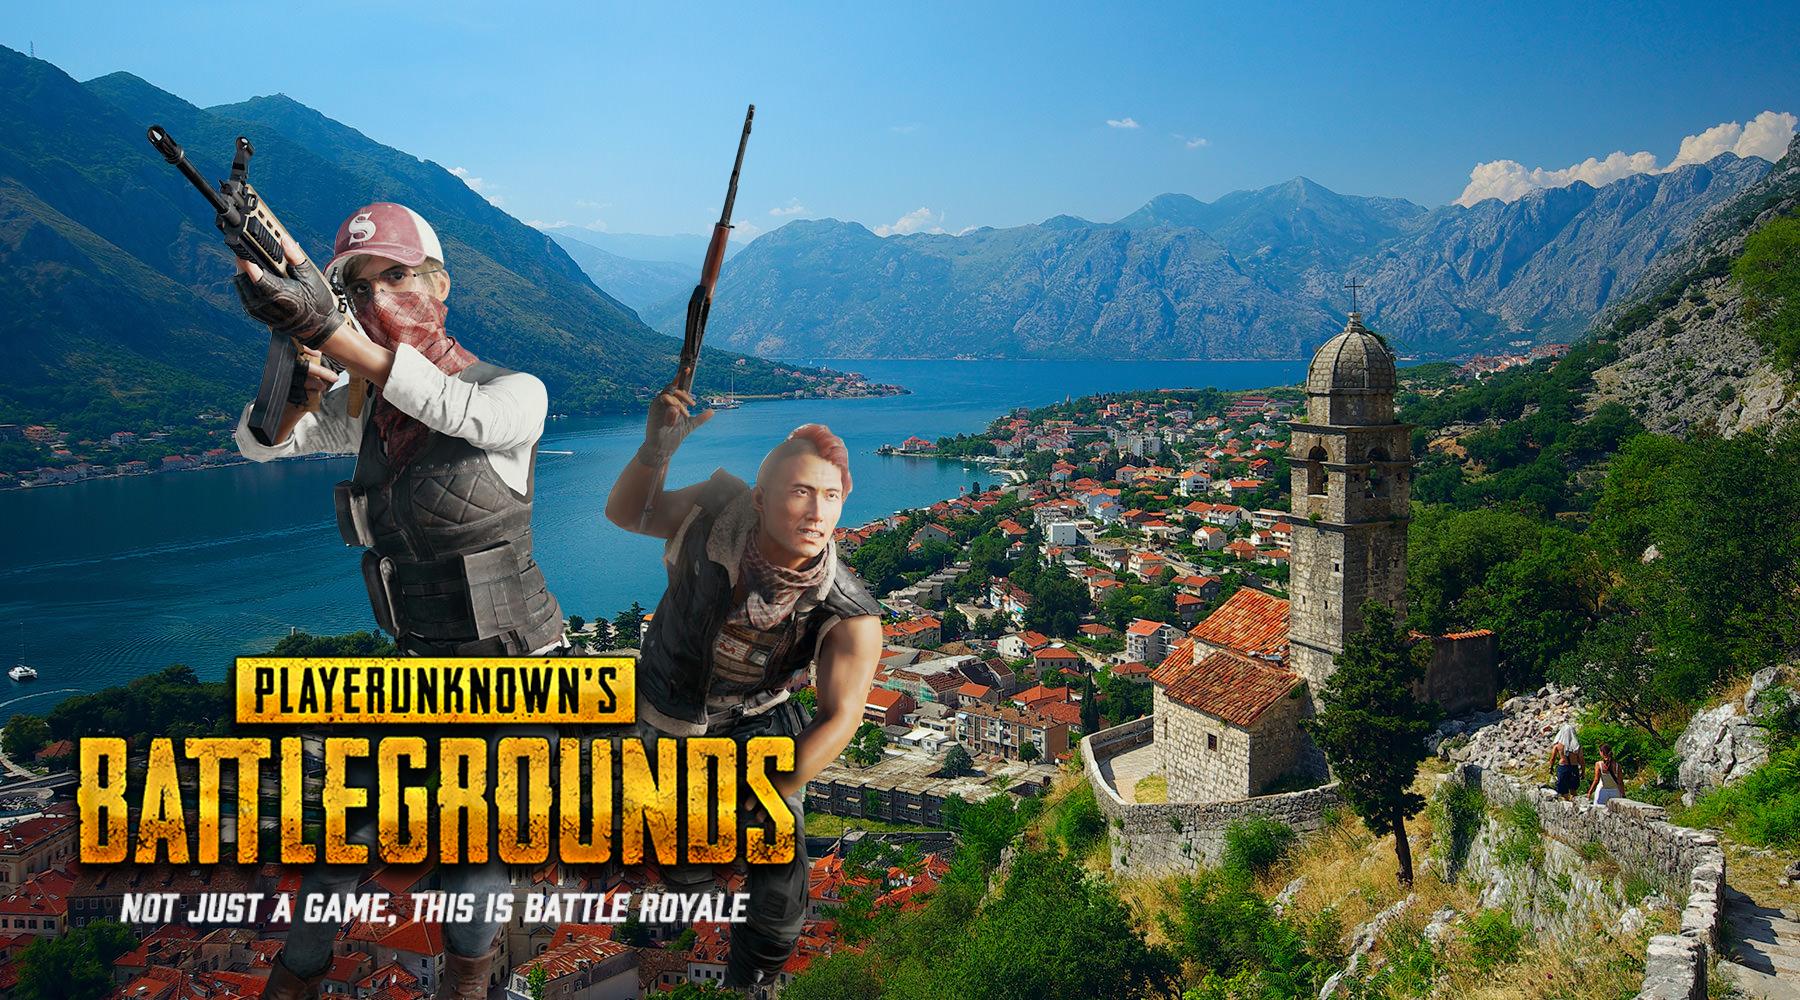 Best Playerunknown S Battlegrounds Communities On Reddit: The Third PlayerUnknown's Battlegrounds Map Will Be Set In